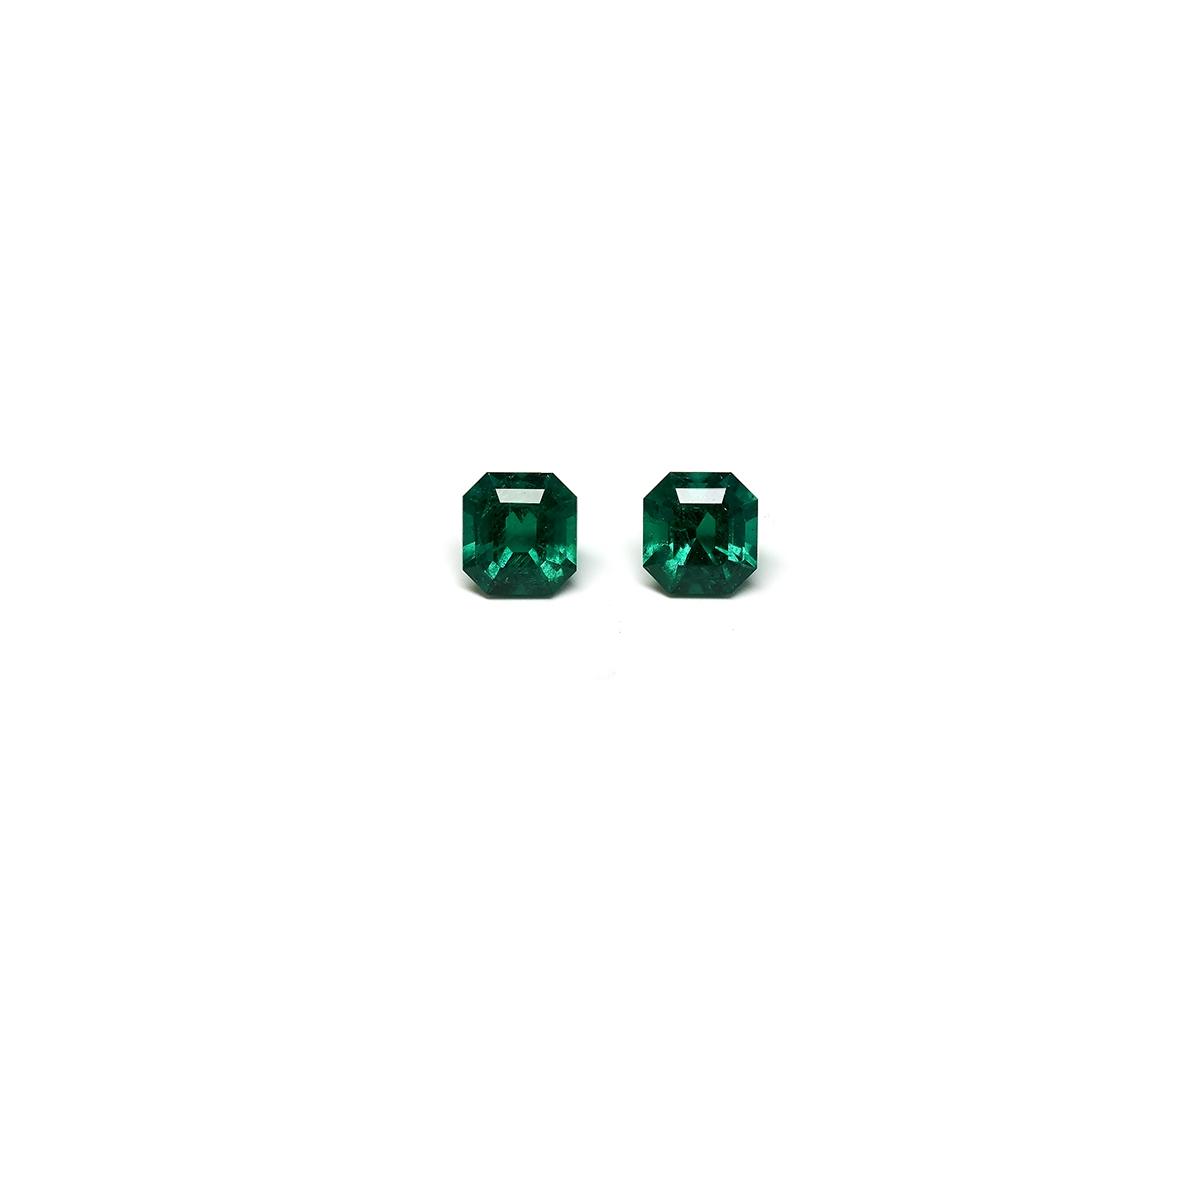 9 carat emerald cut pair